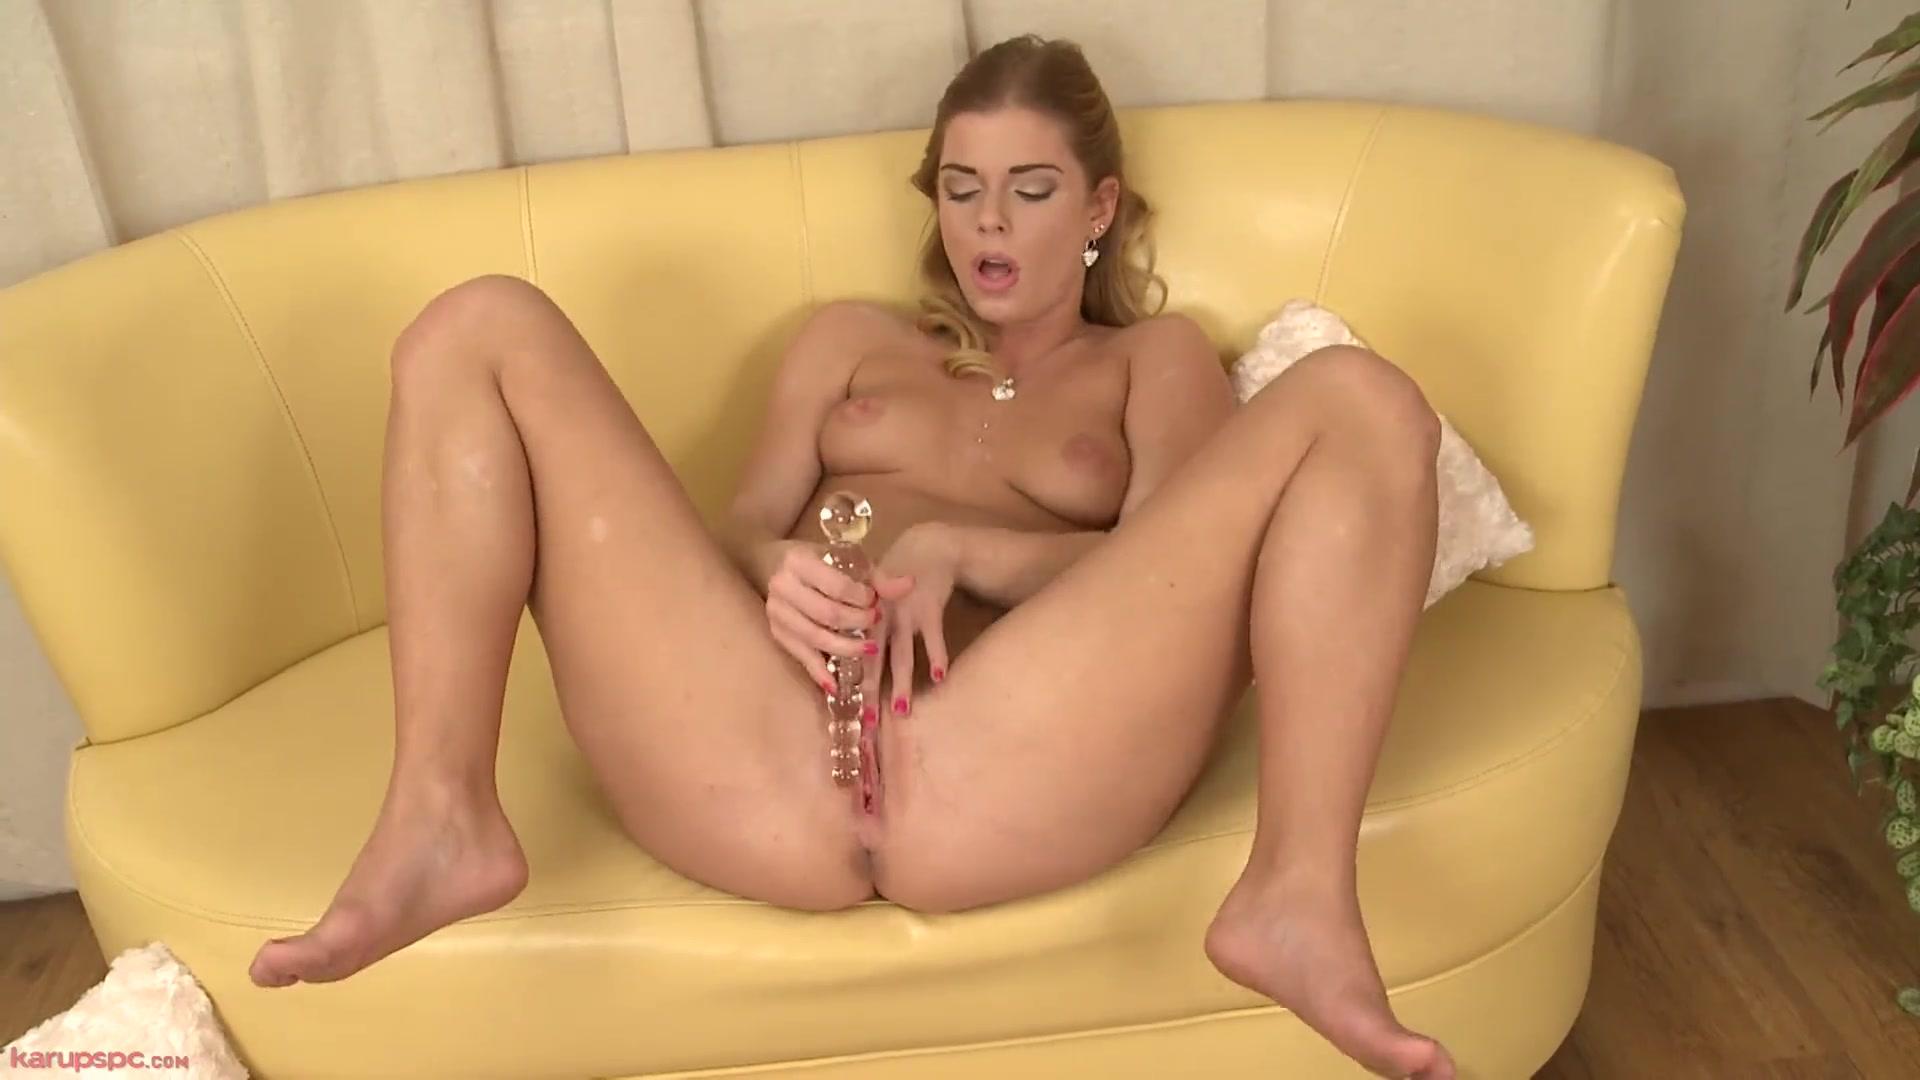 Видео подборка оргазма от мастурбации